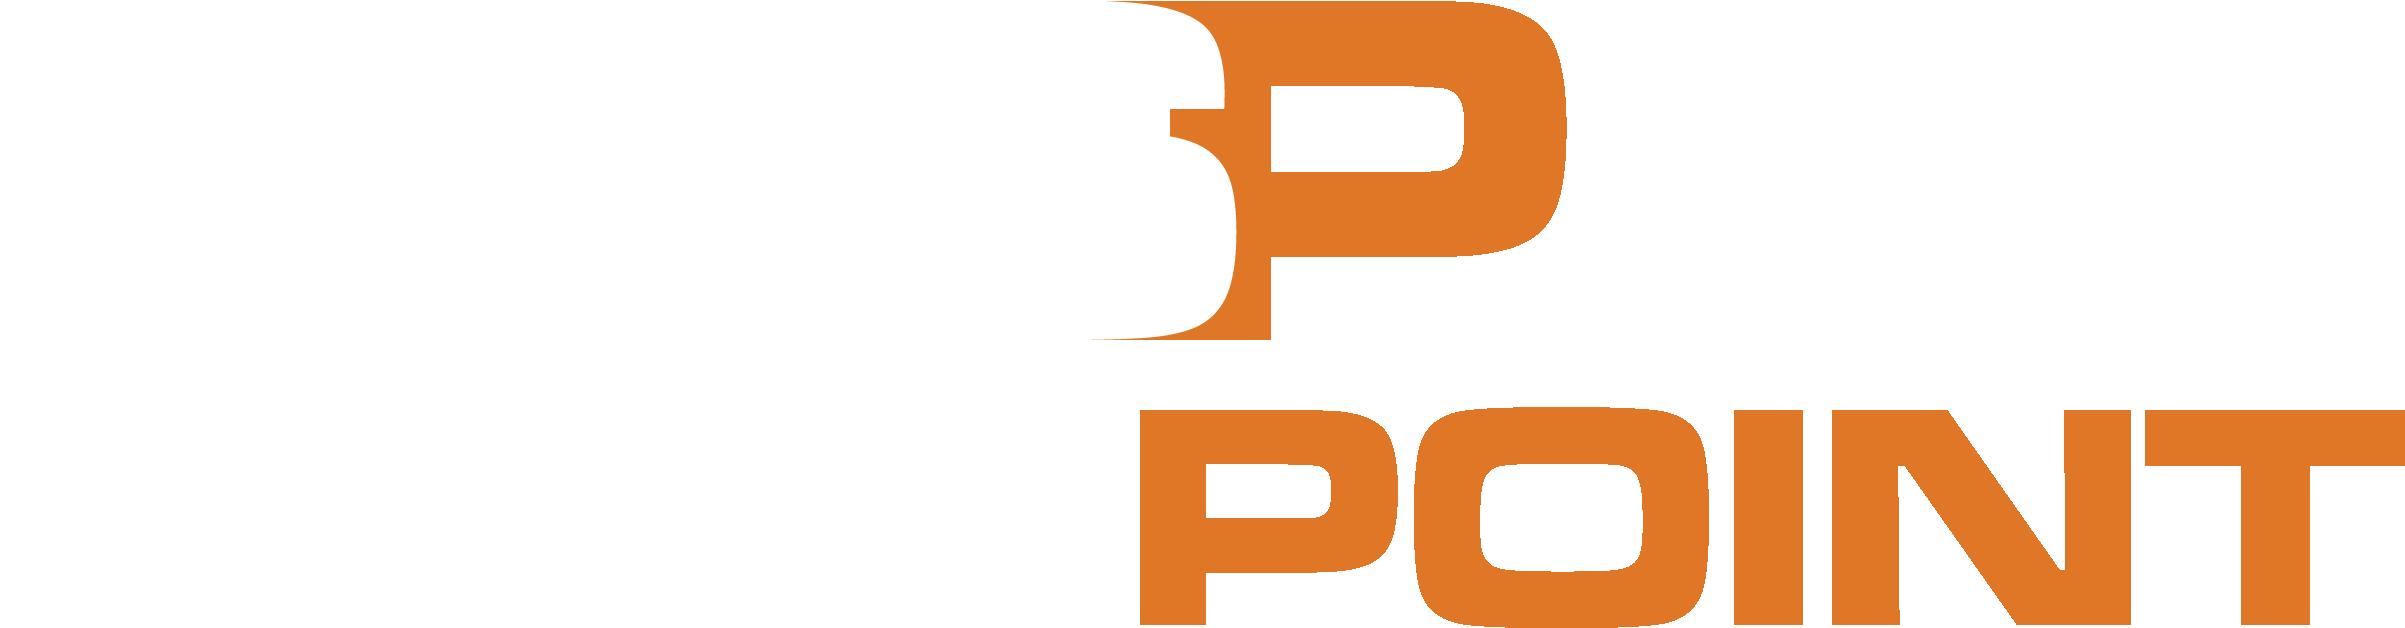 SP_full logo 2019_white and orange.png